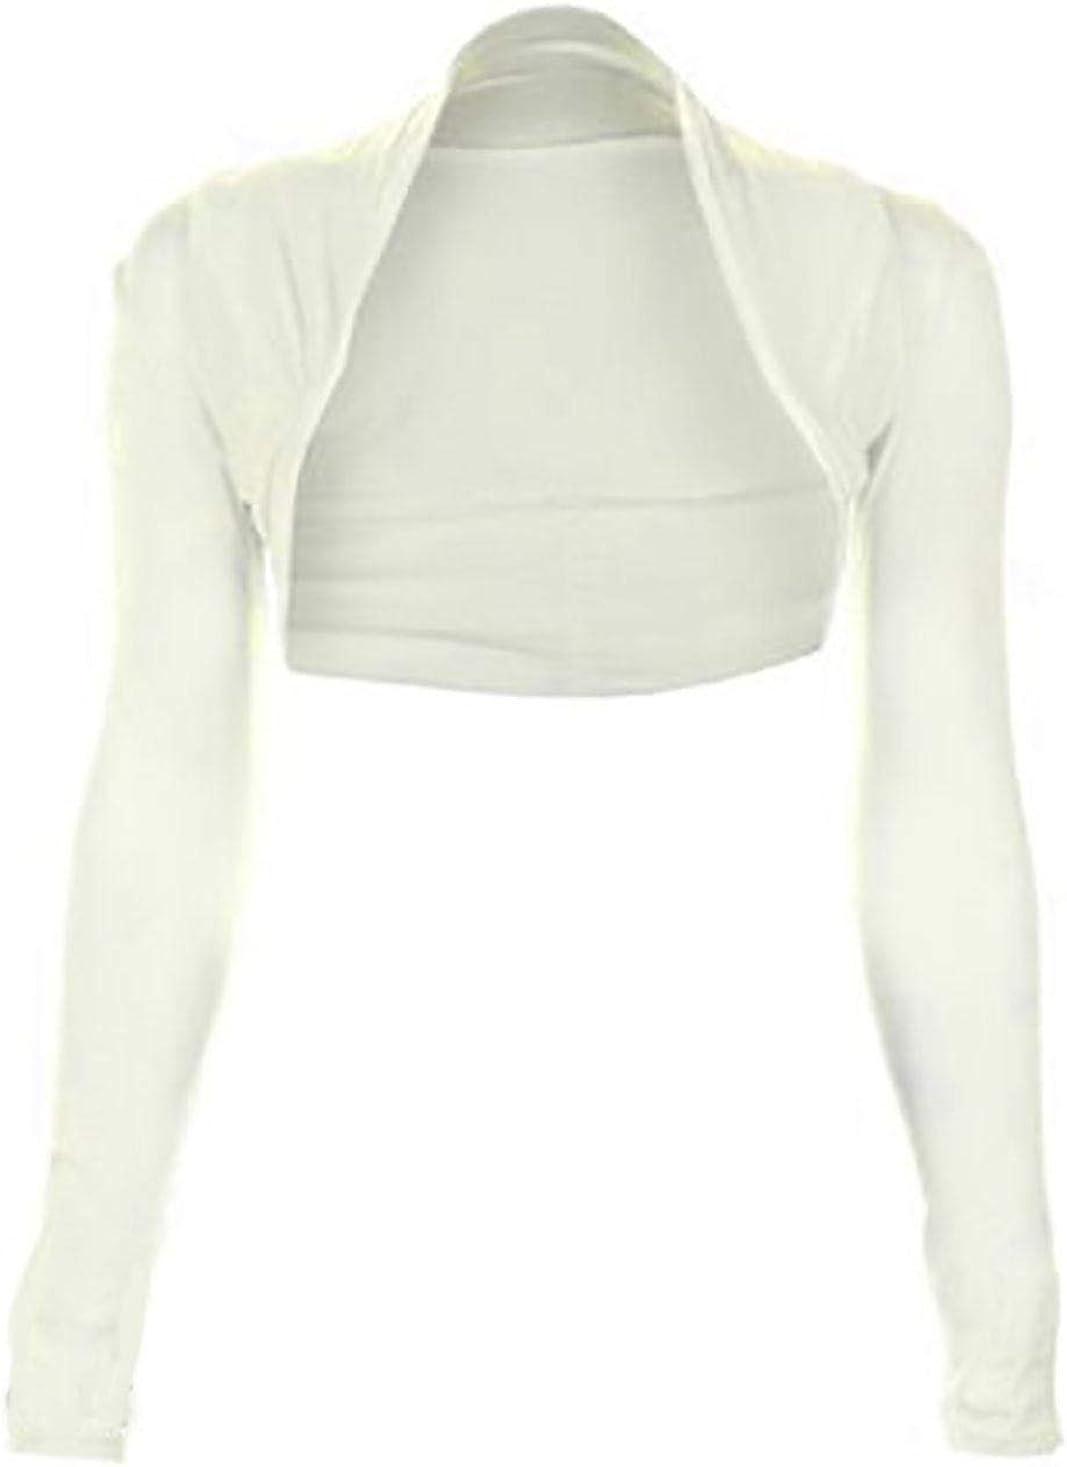 Rimi Hanger Womens Long Sleeve Plain Bolero Shrug Ladies Plus Size Party Wear Shrug Top Small/XXX Large